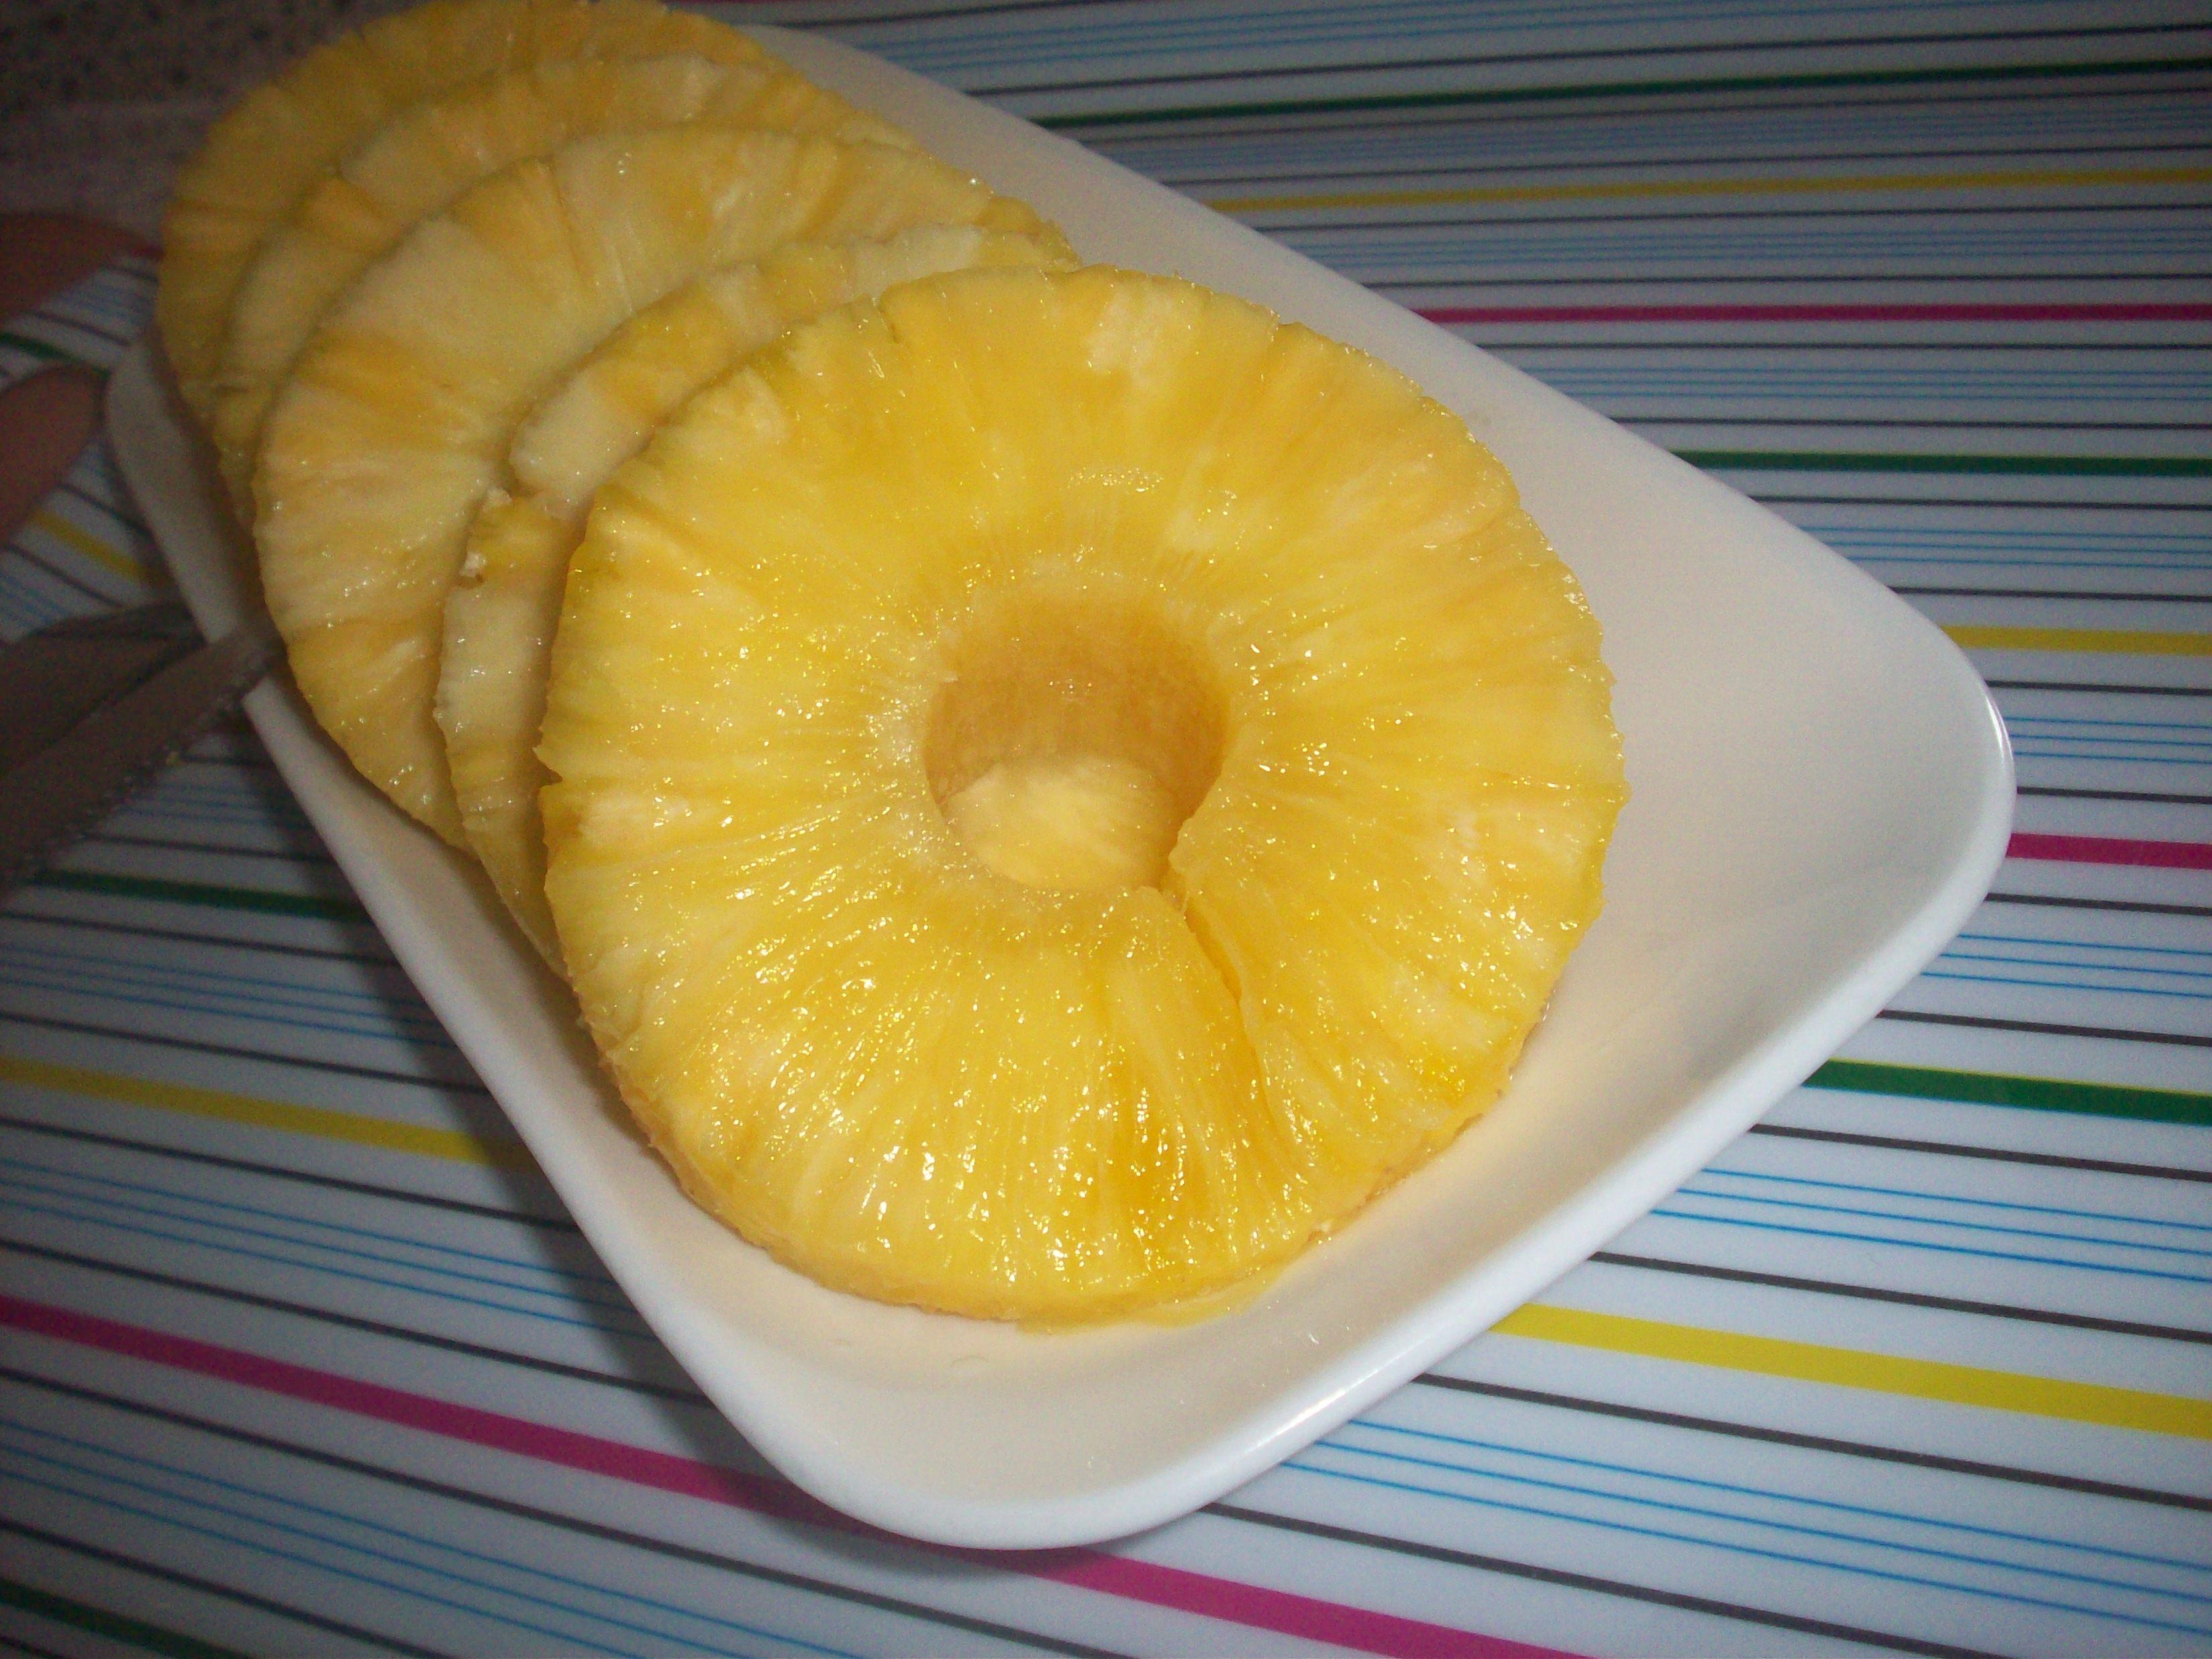 http://foodloader.net/cutie_2010-05-18_Pineapple.jpg